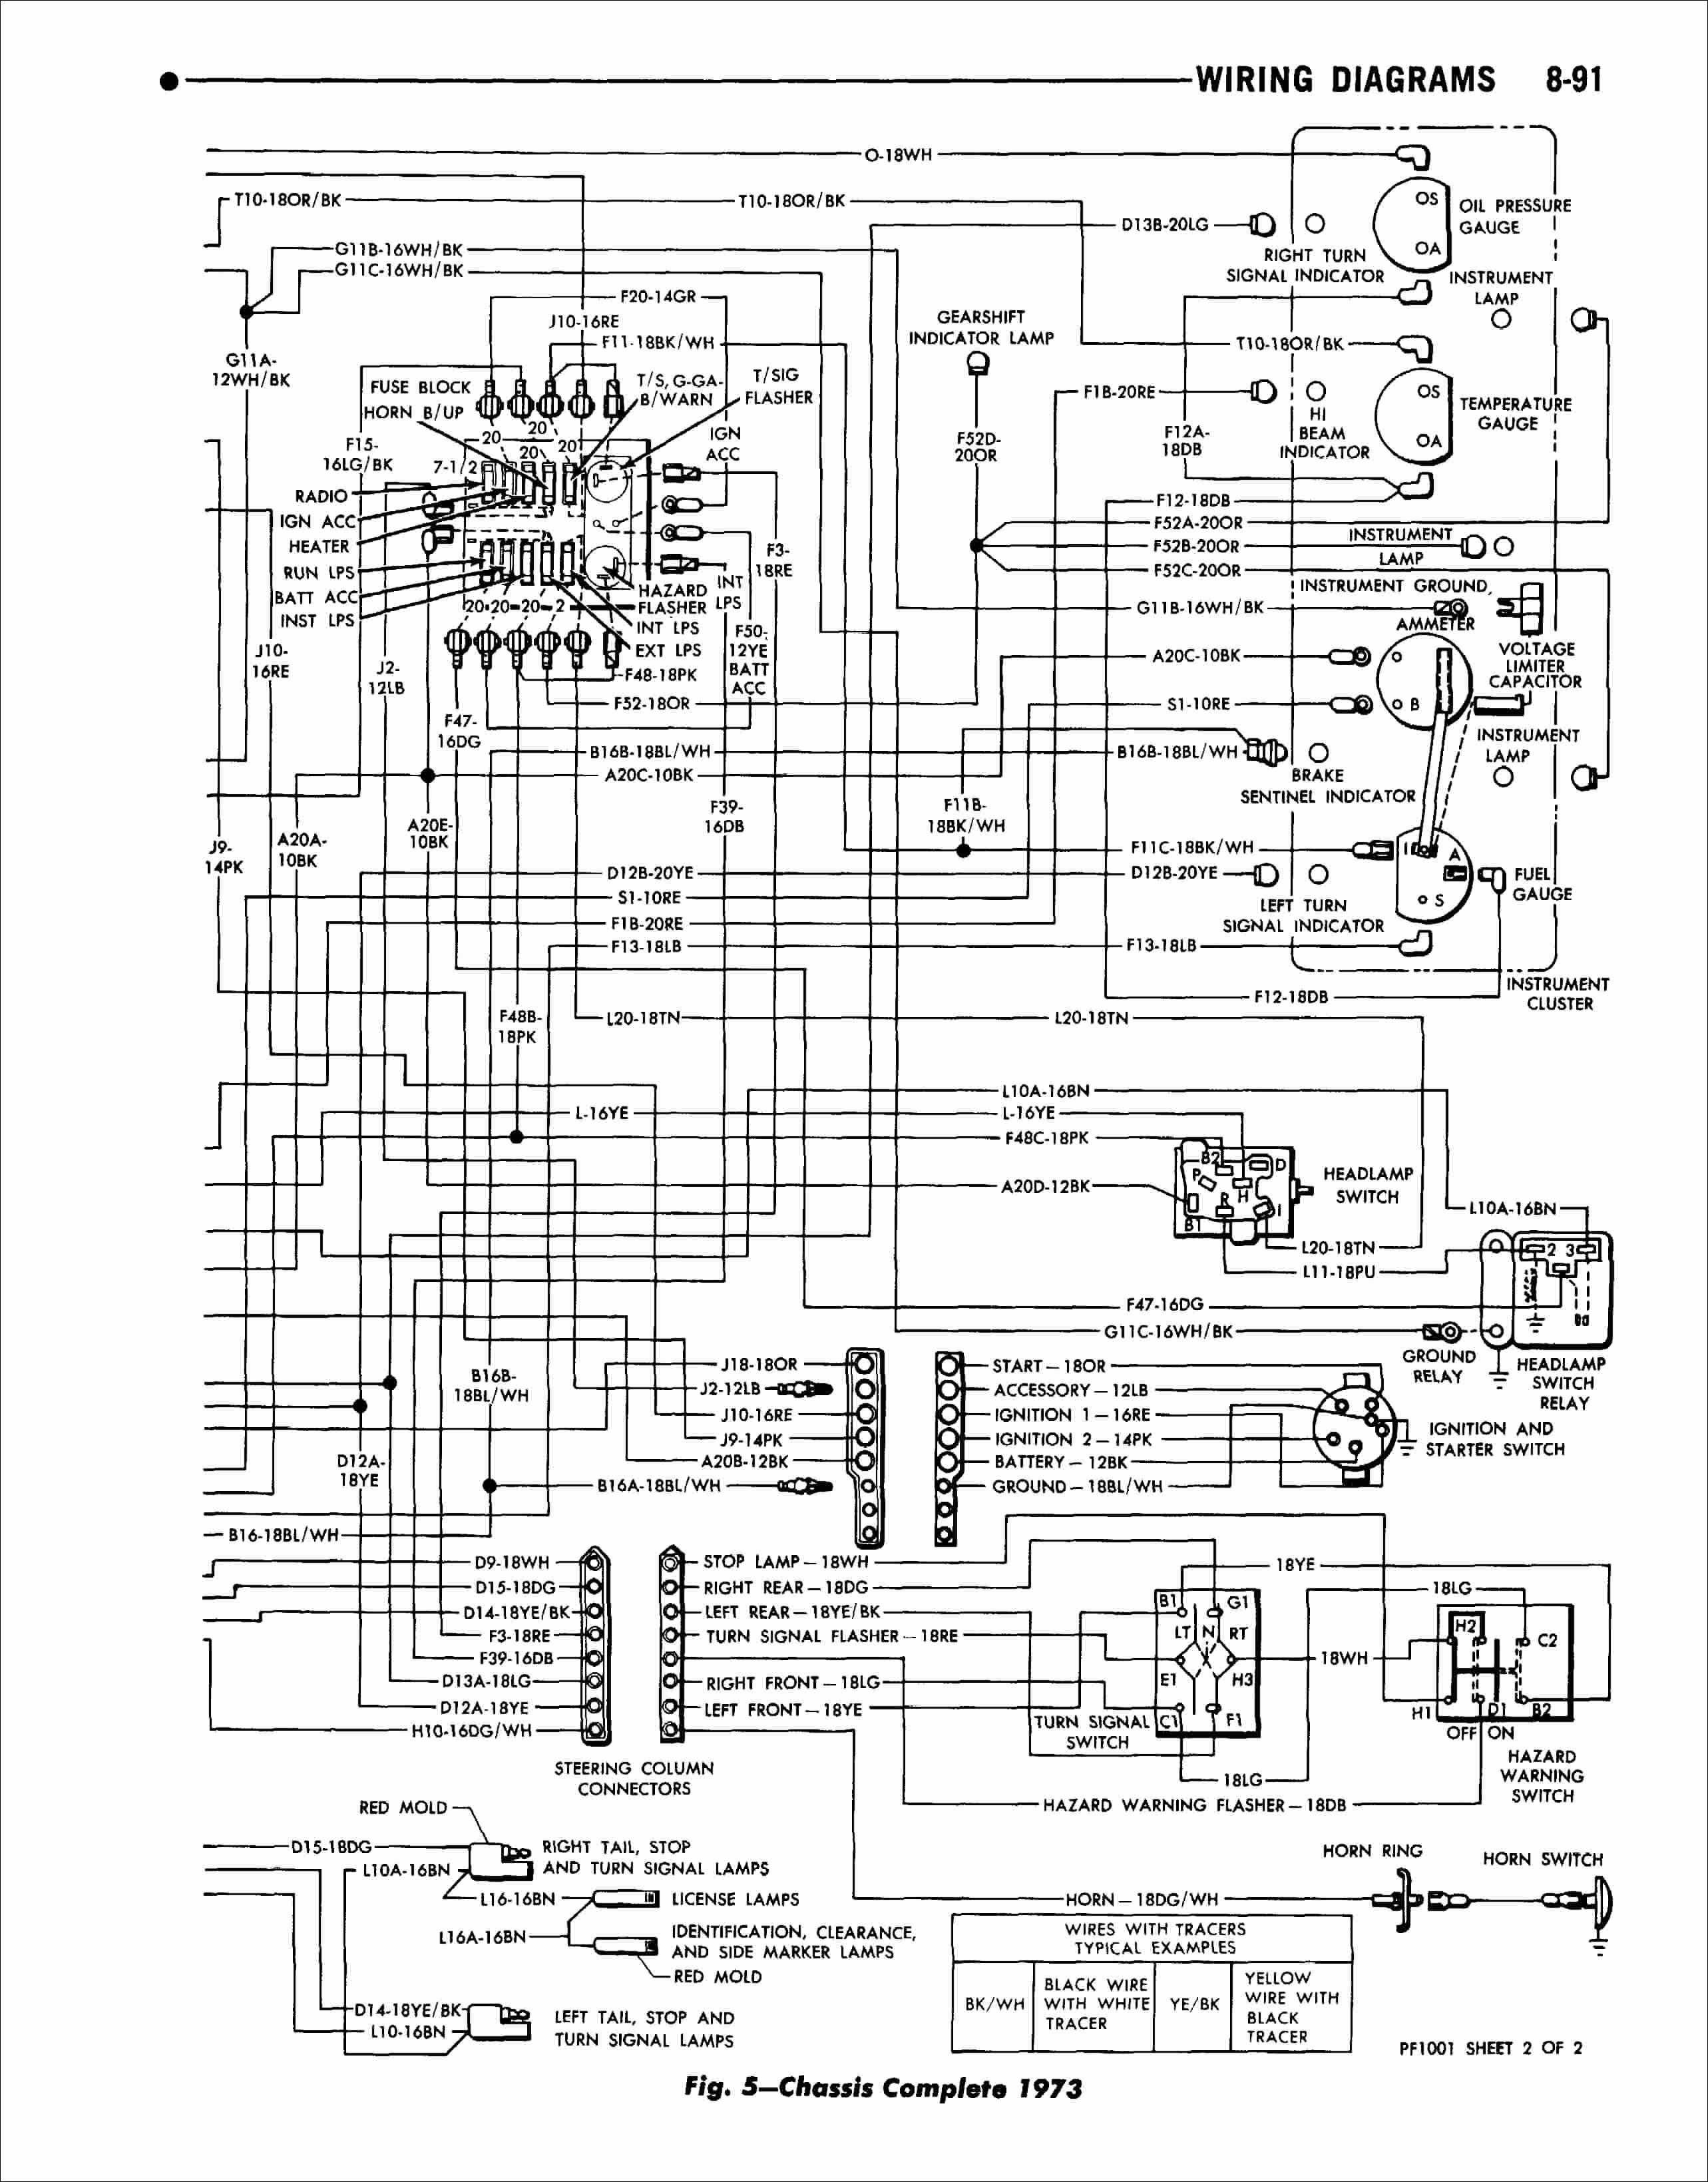 Wfco 8725 Wiring Diagram Wfco 8735 Wiring Diagram